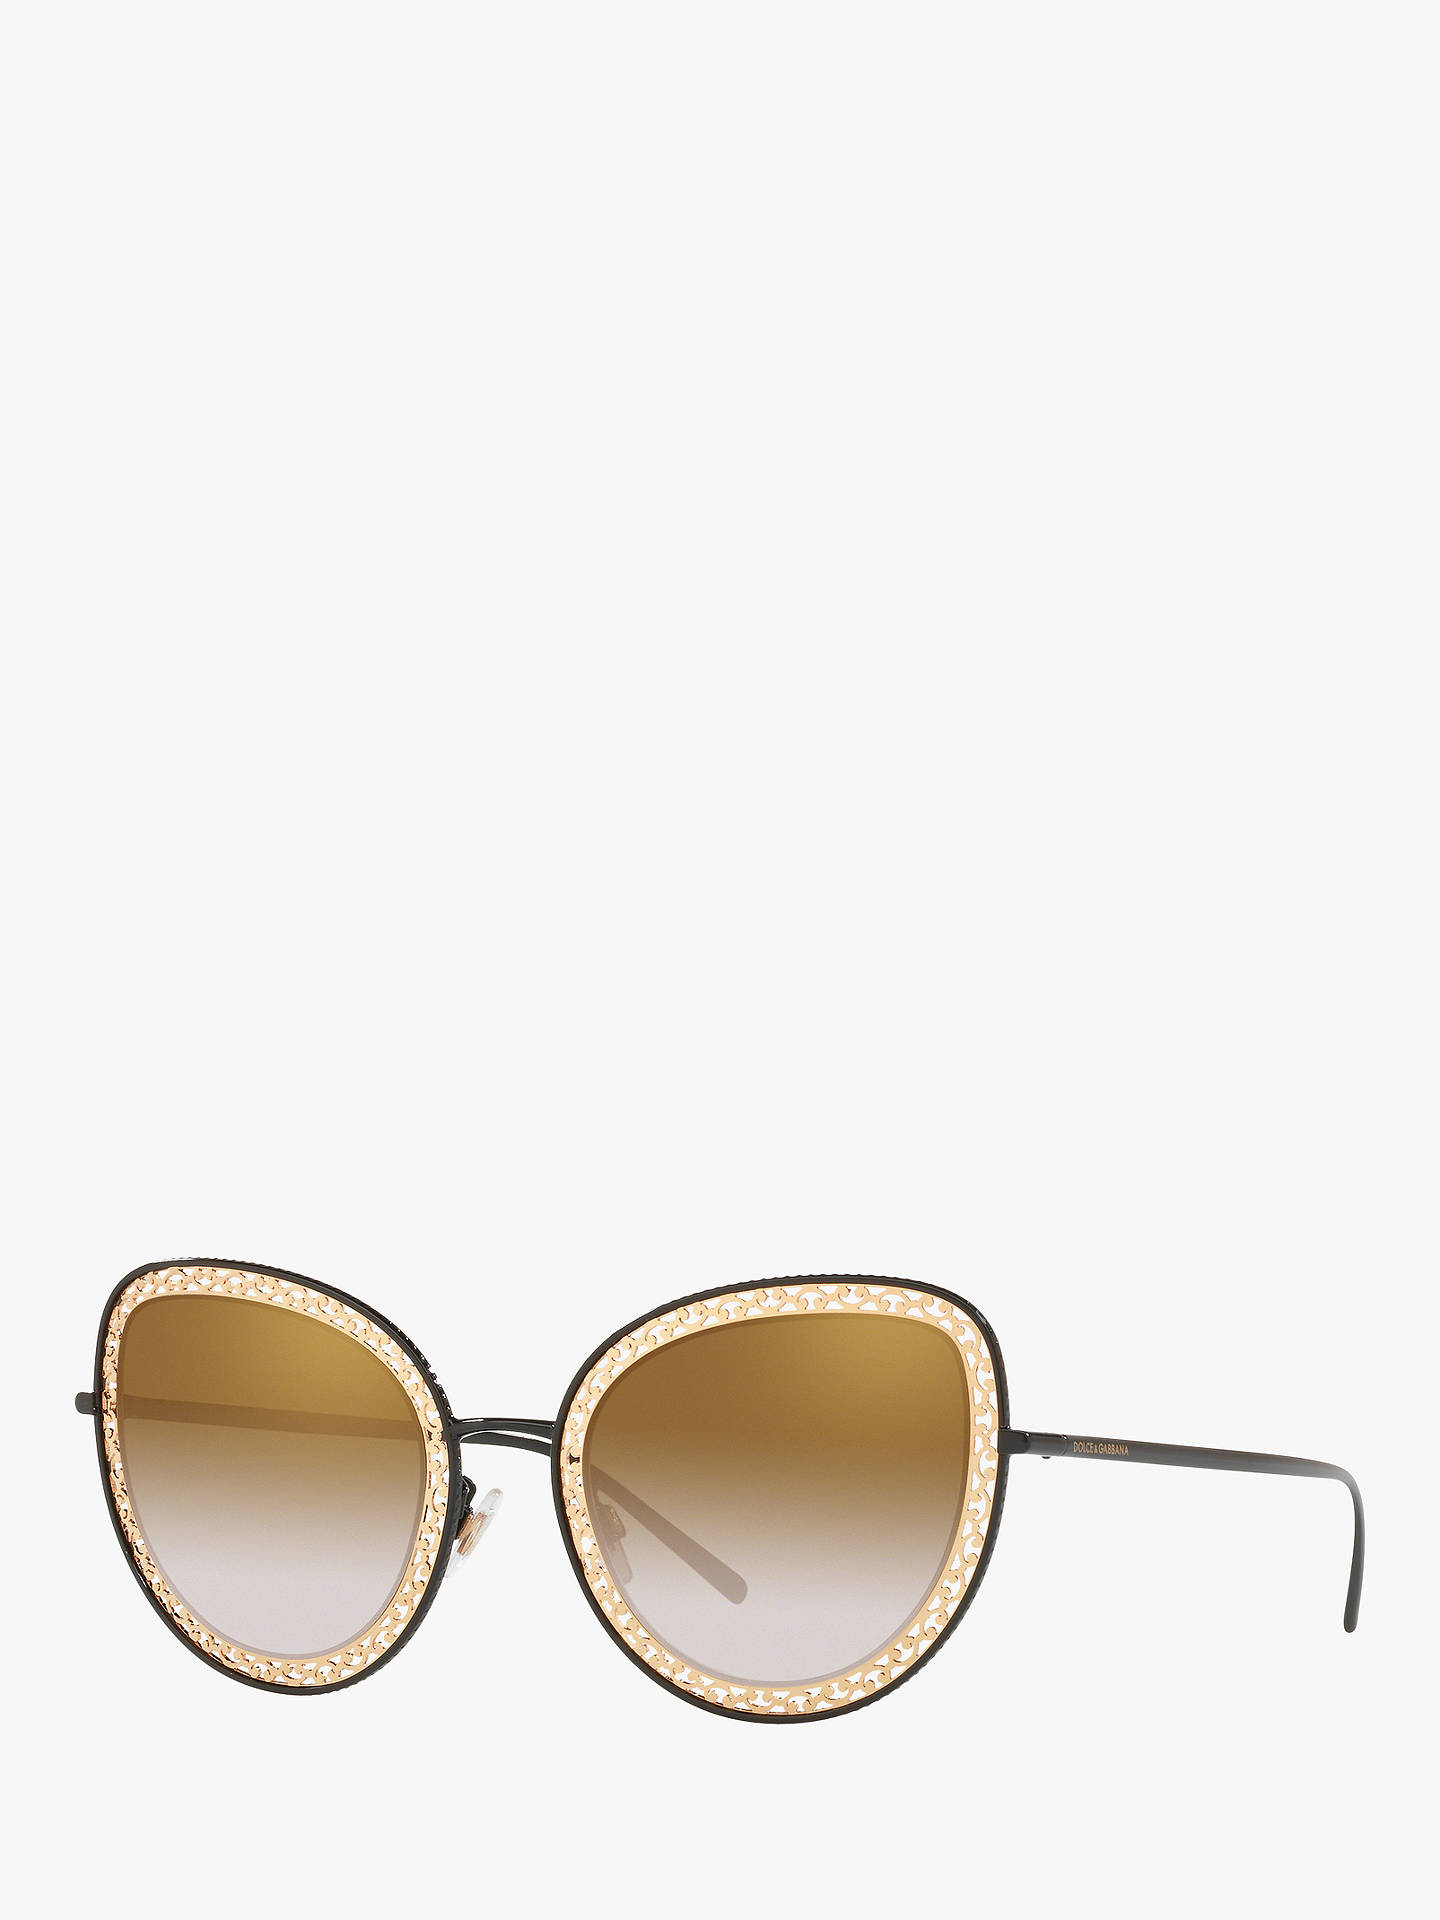 336c9d5a79fd Buy Dolce & Gabbana DG2226 Women's Cat's Eye Sunglasses, Black/Brown  Gradient Online at ...